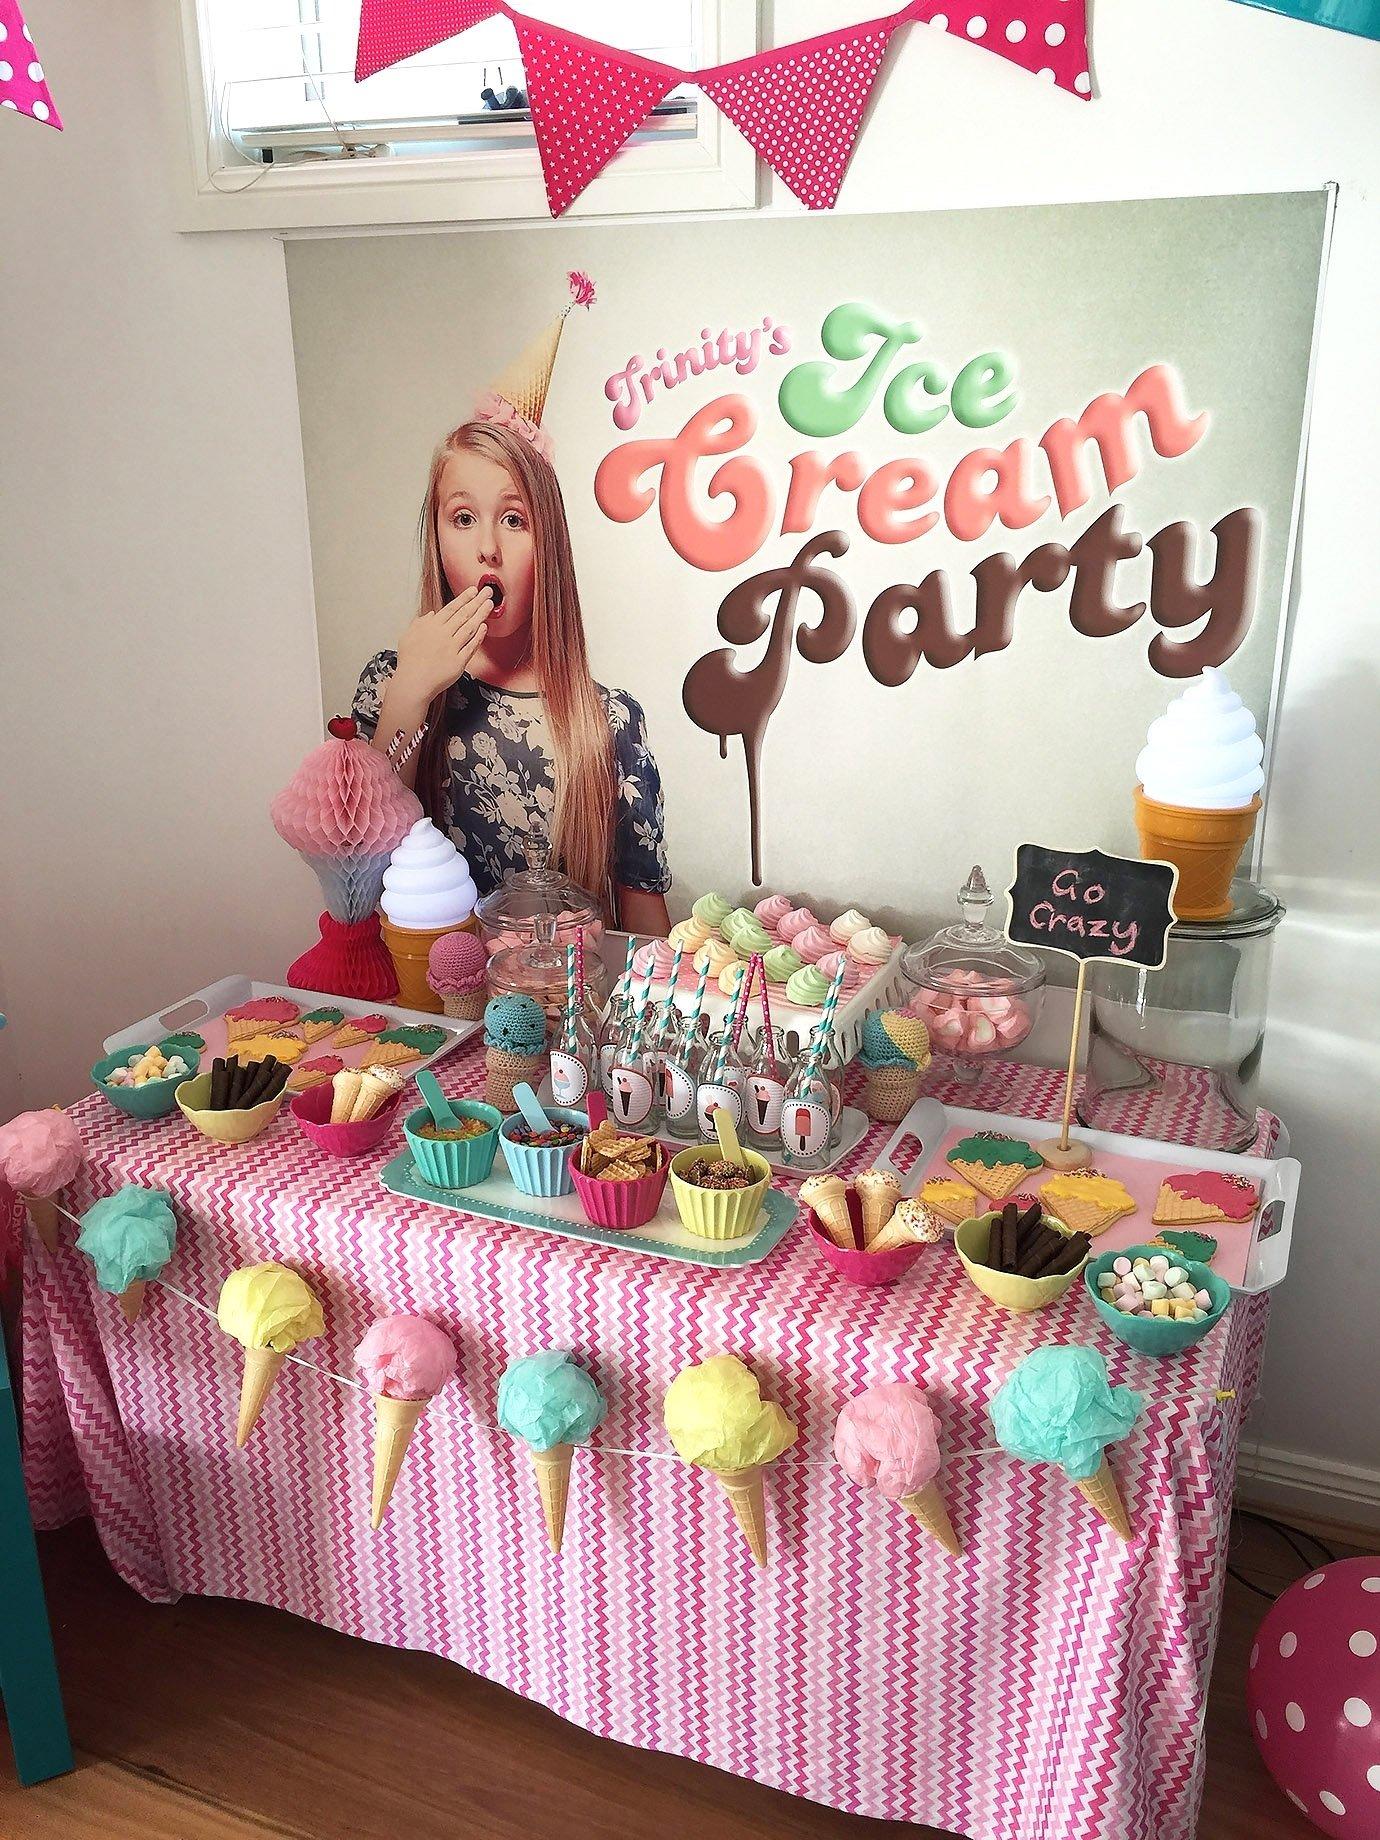 10 Fabulous Ice Cream Birthday Party Ideas ice cream party 10th birthday and birthdays 2020